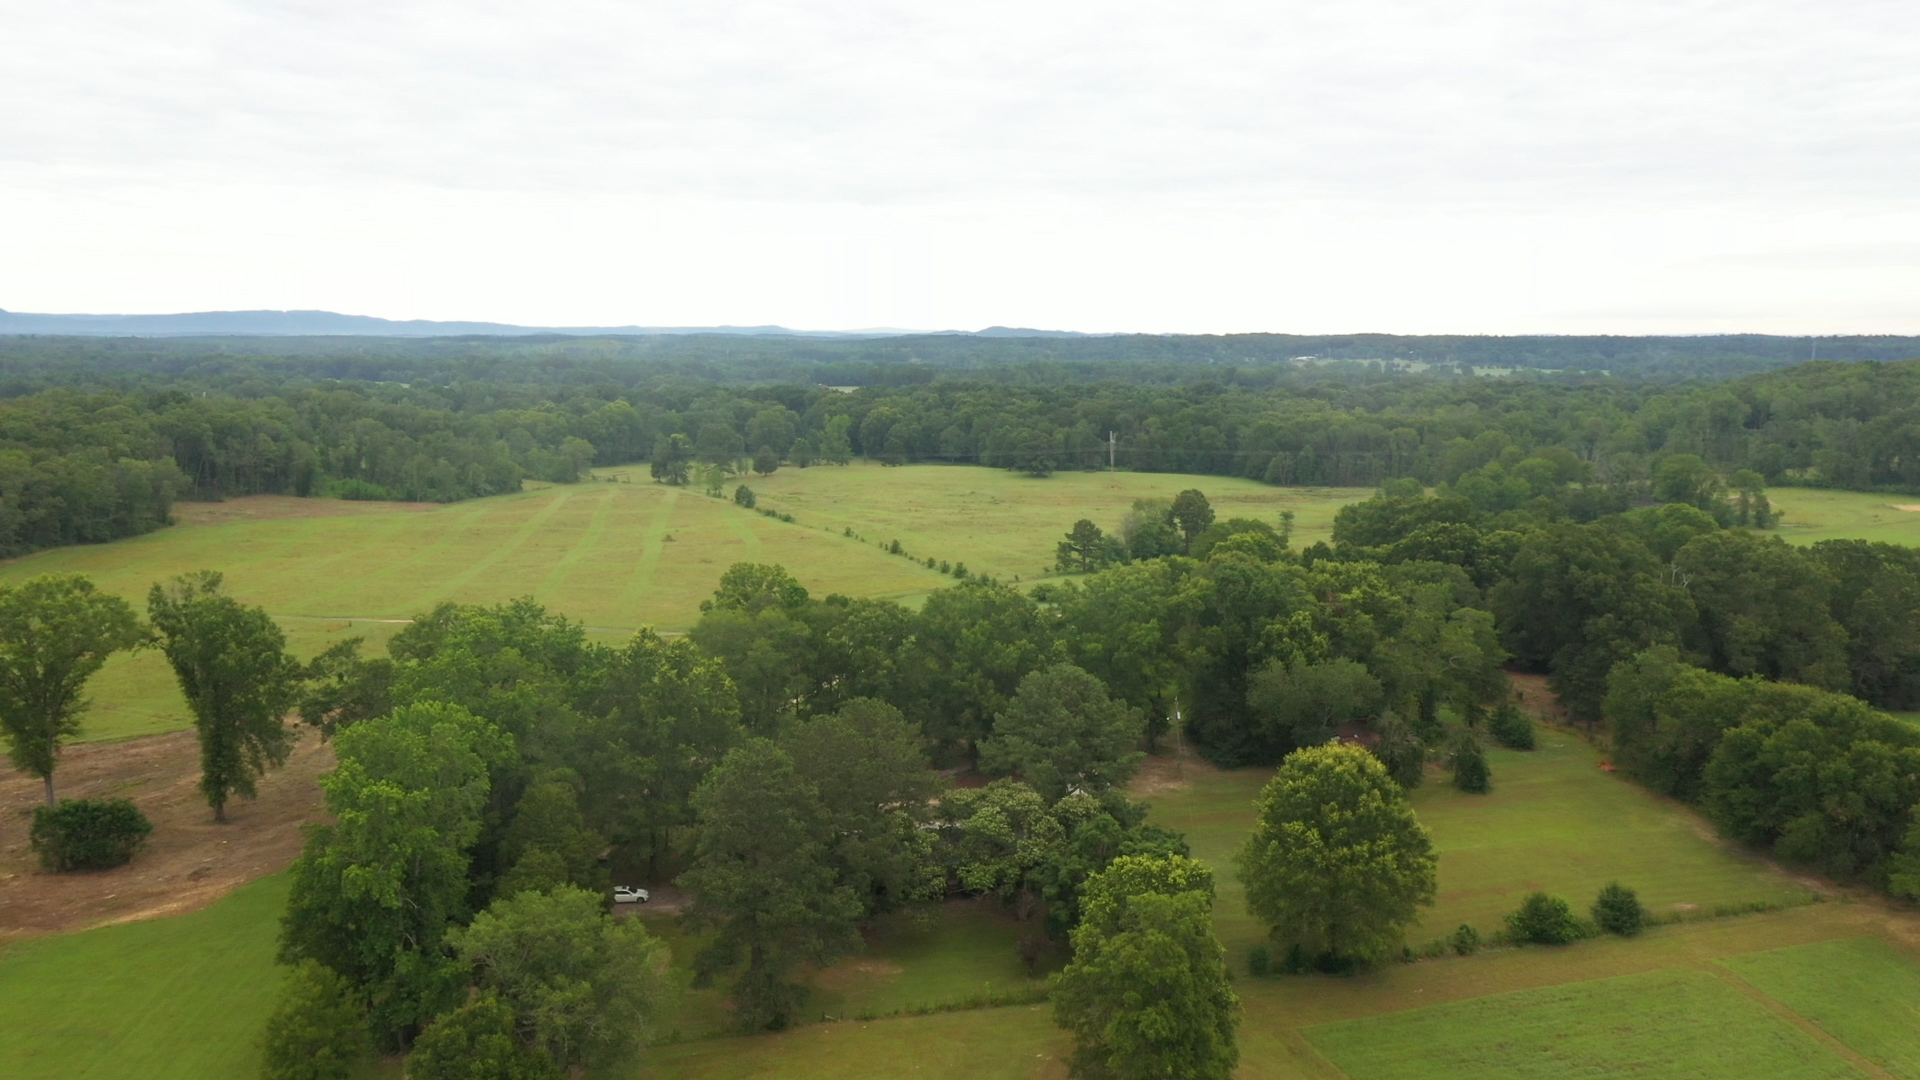 Pasture - tree line